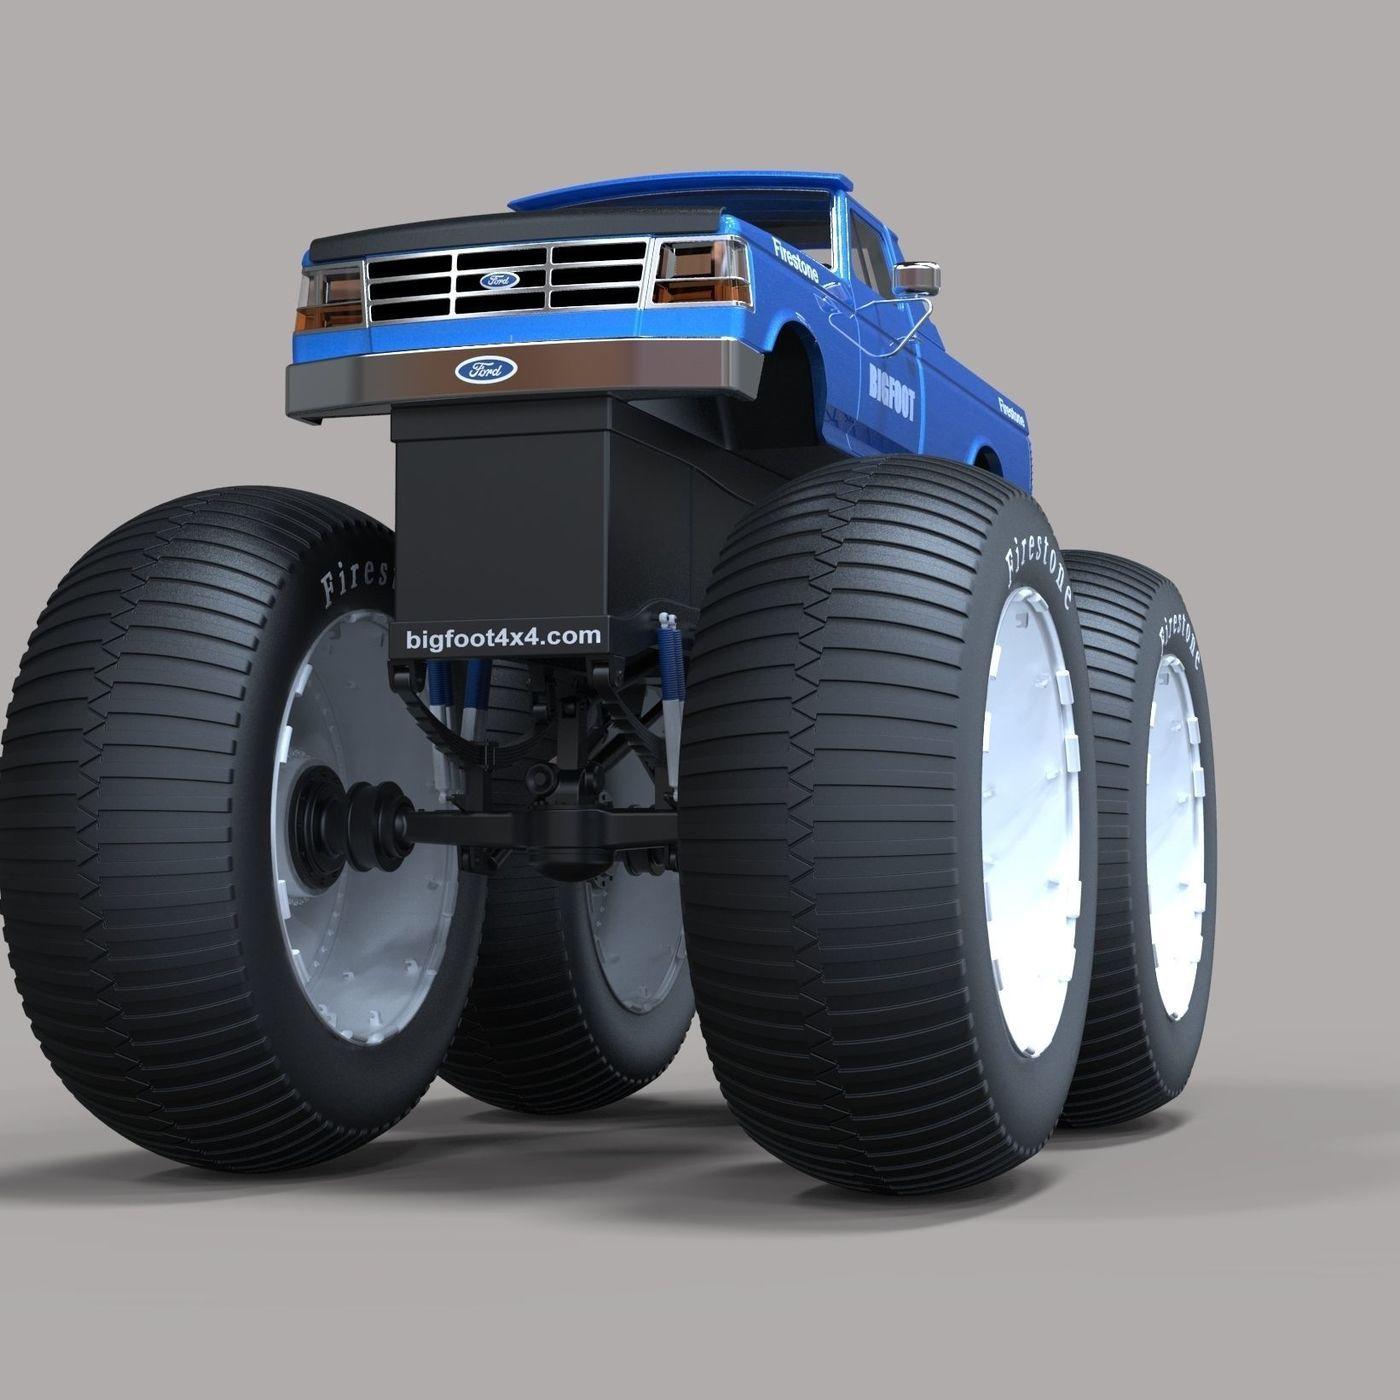 Bigfoot 5 Largest Monster Truck